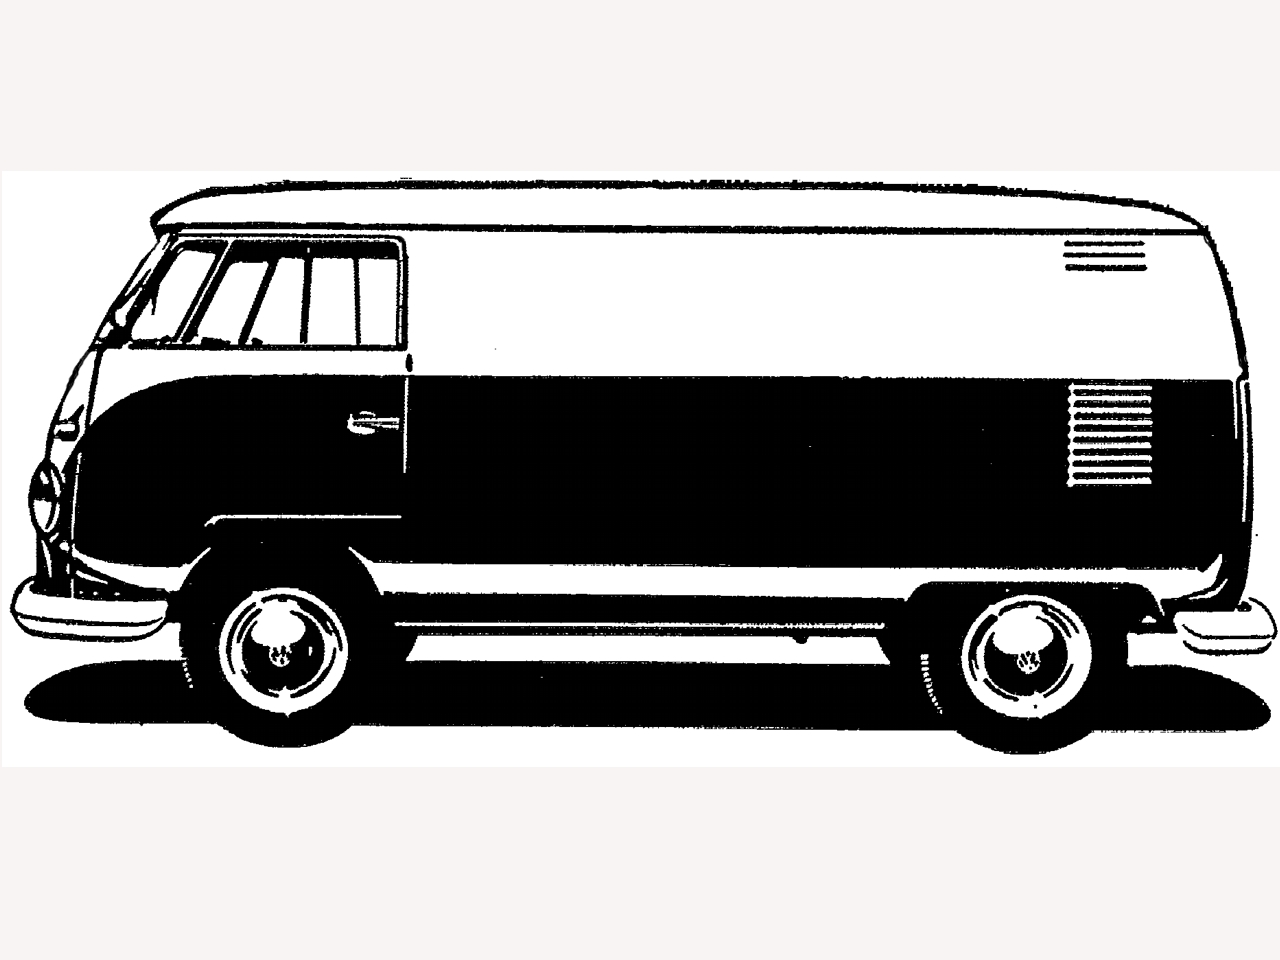 VW BUS PANEL